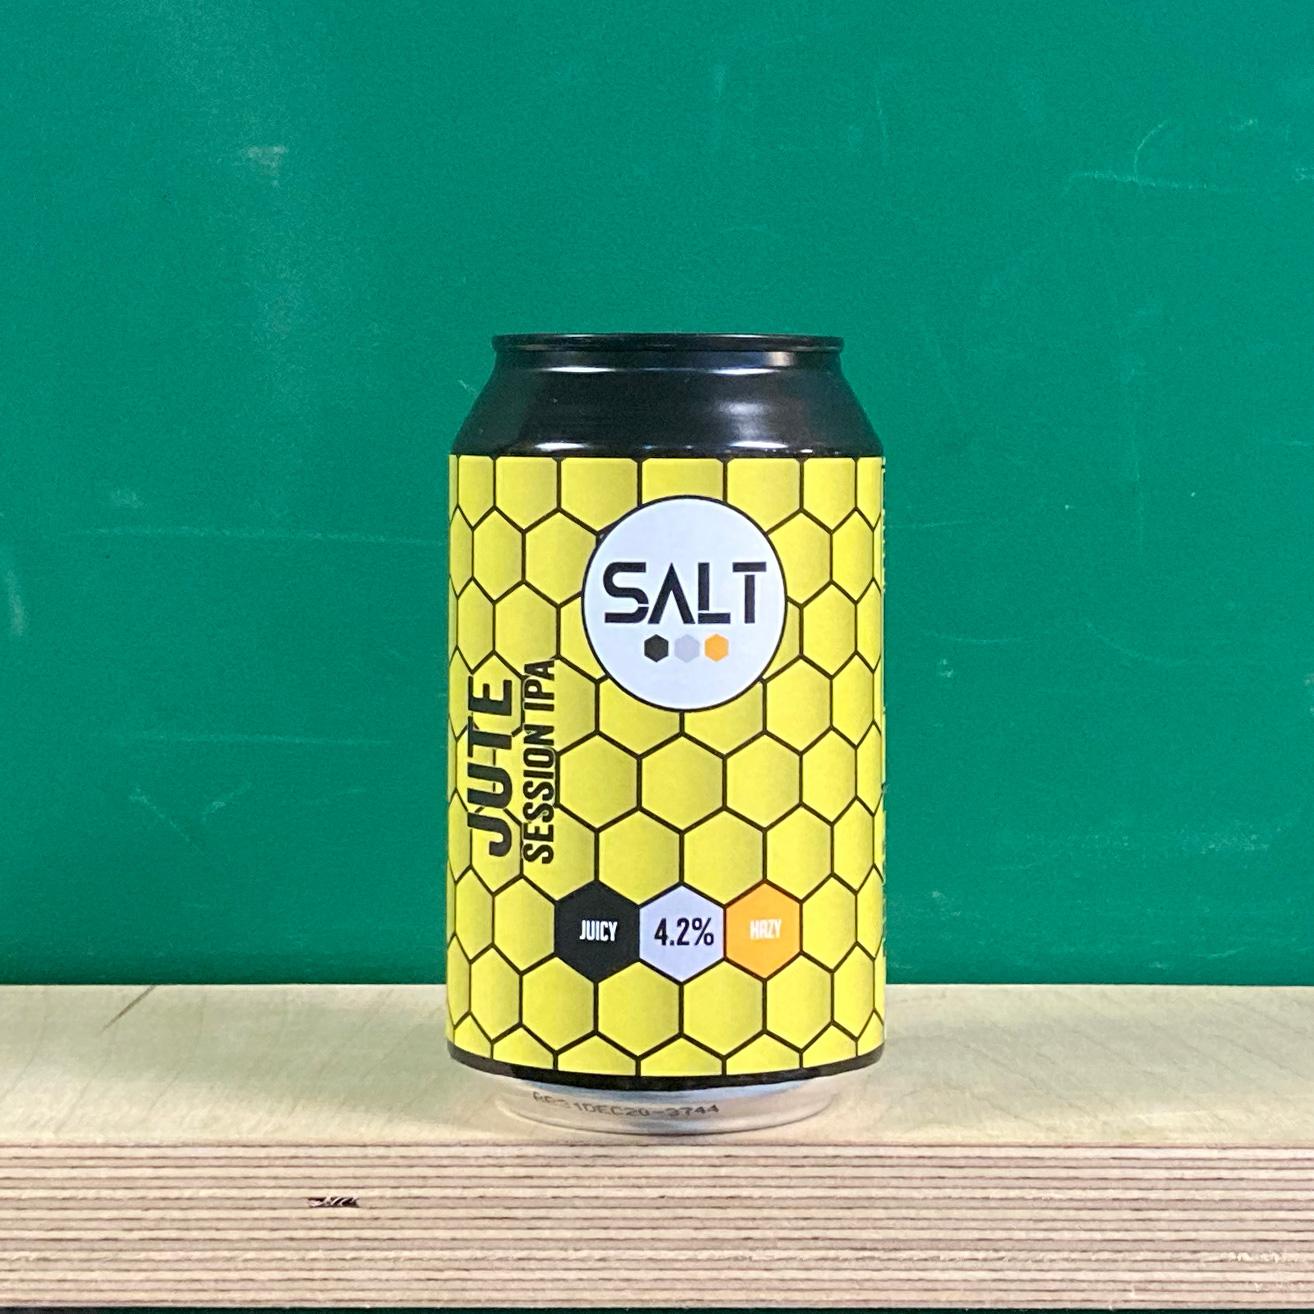 Salt Jute